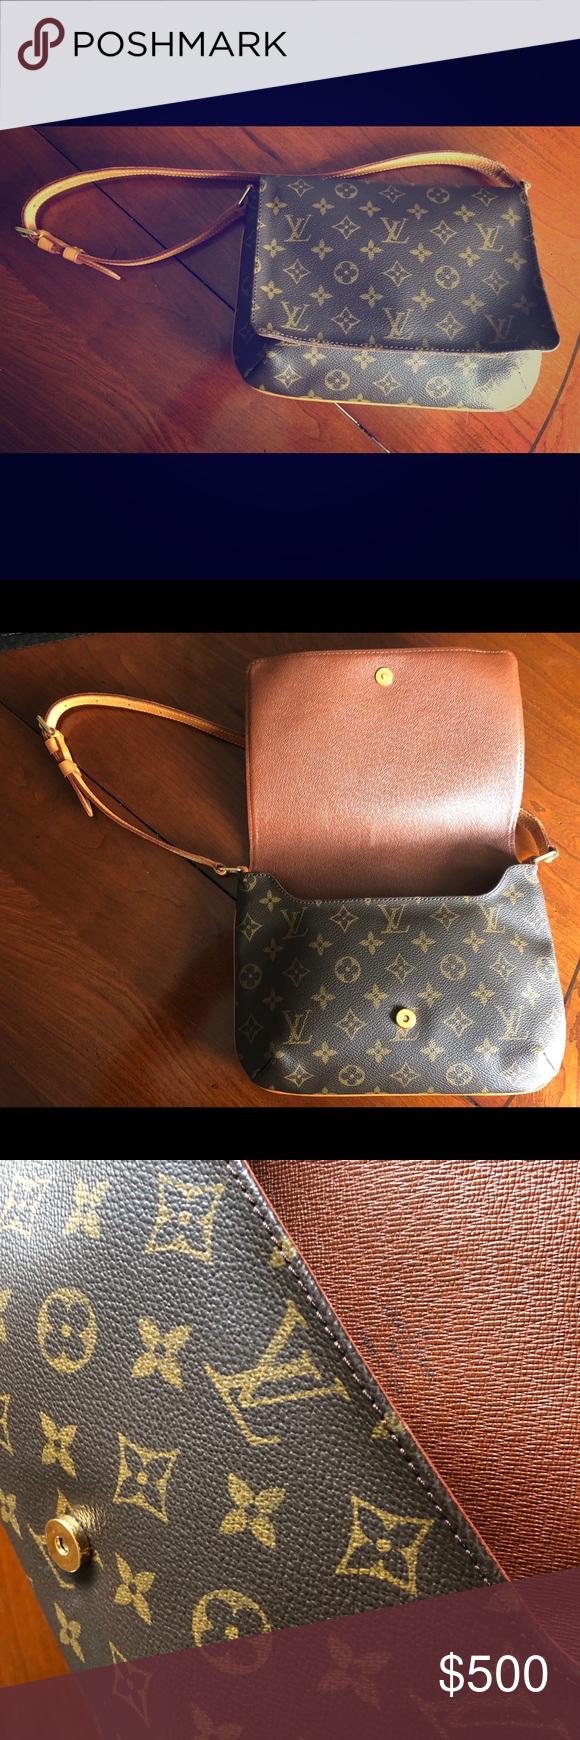 e0e61c052054 Messenger Bags · Vintage Louis Vuitton Musette Tango Short Strap Vintage  Louis Vuitton Musette Tango Short Strap This authentic